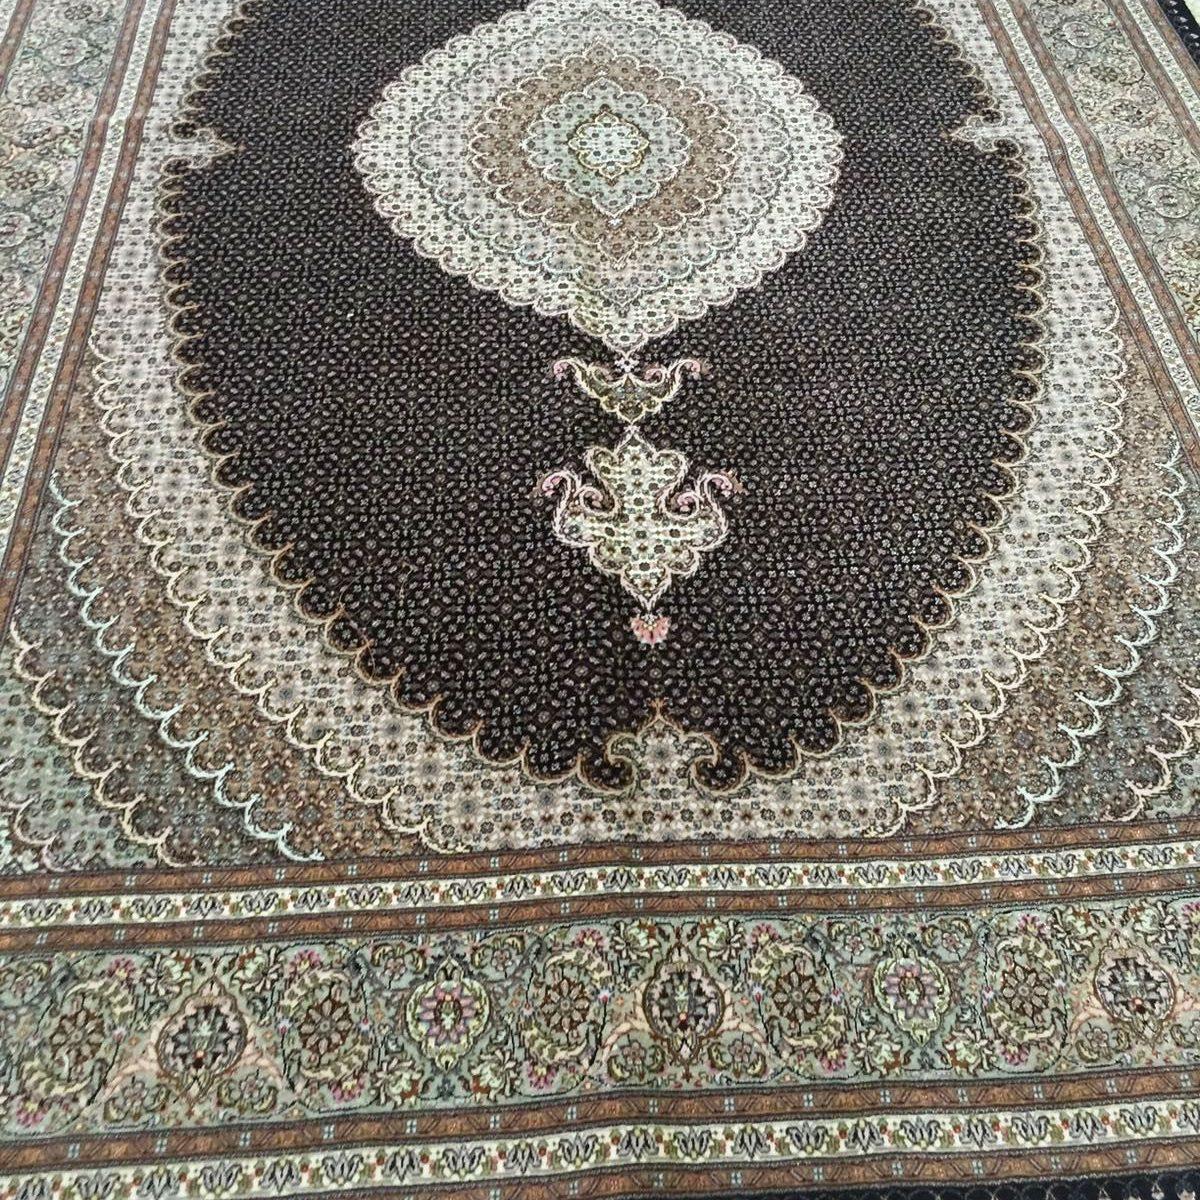 persian tabriz rug10 x 6 5 ft 306 x 199 cm rugs place. Black Bedroom Furniture Sets. Home Design Ideas